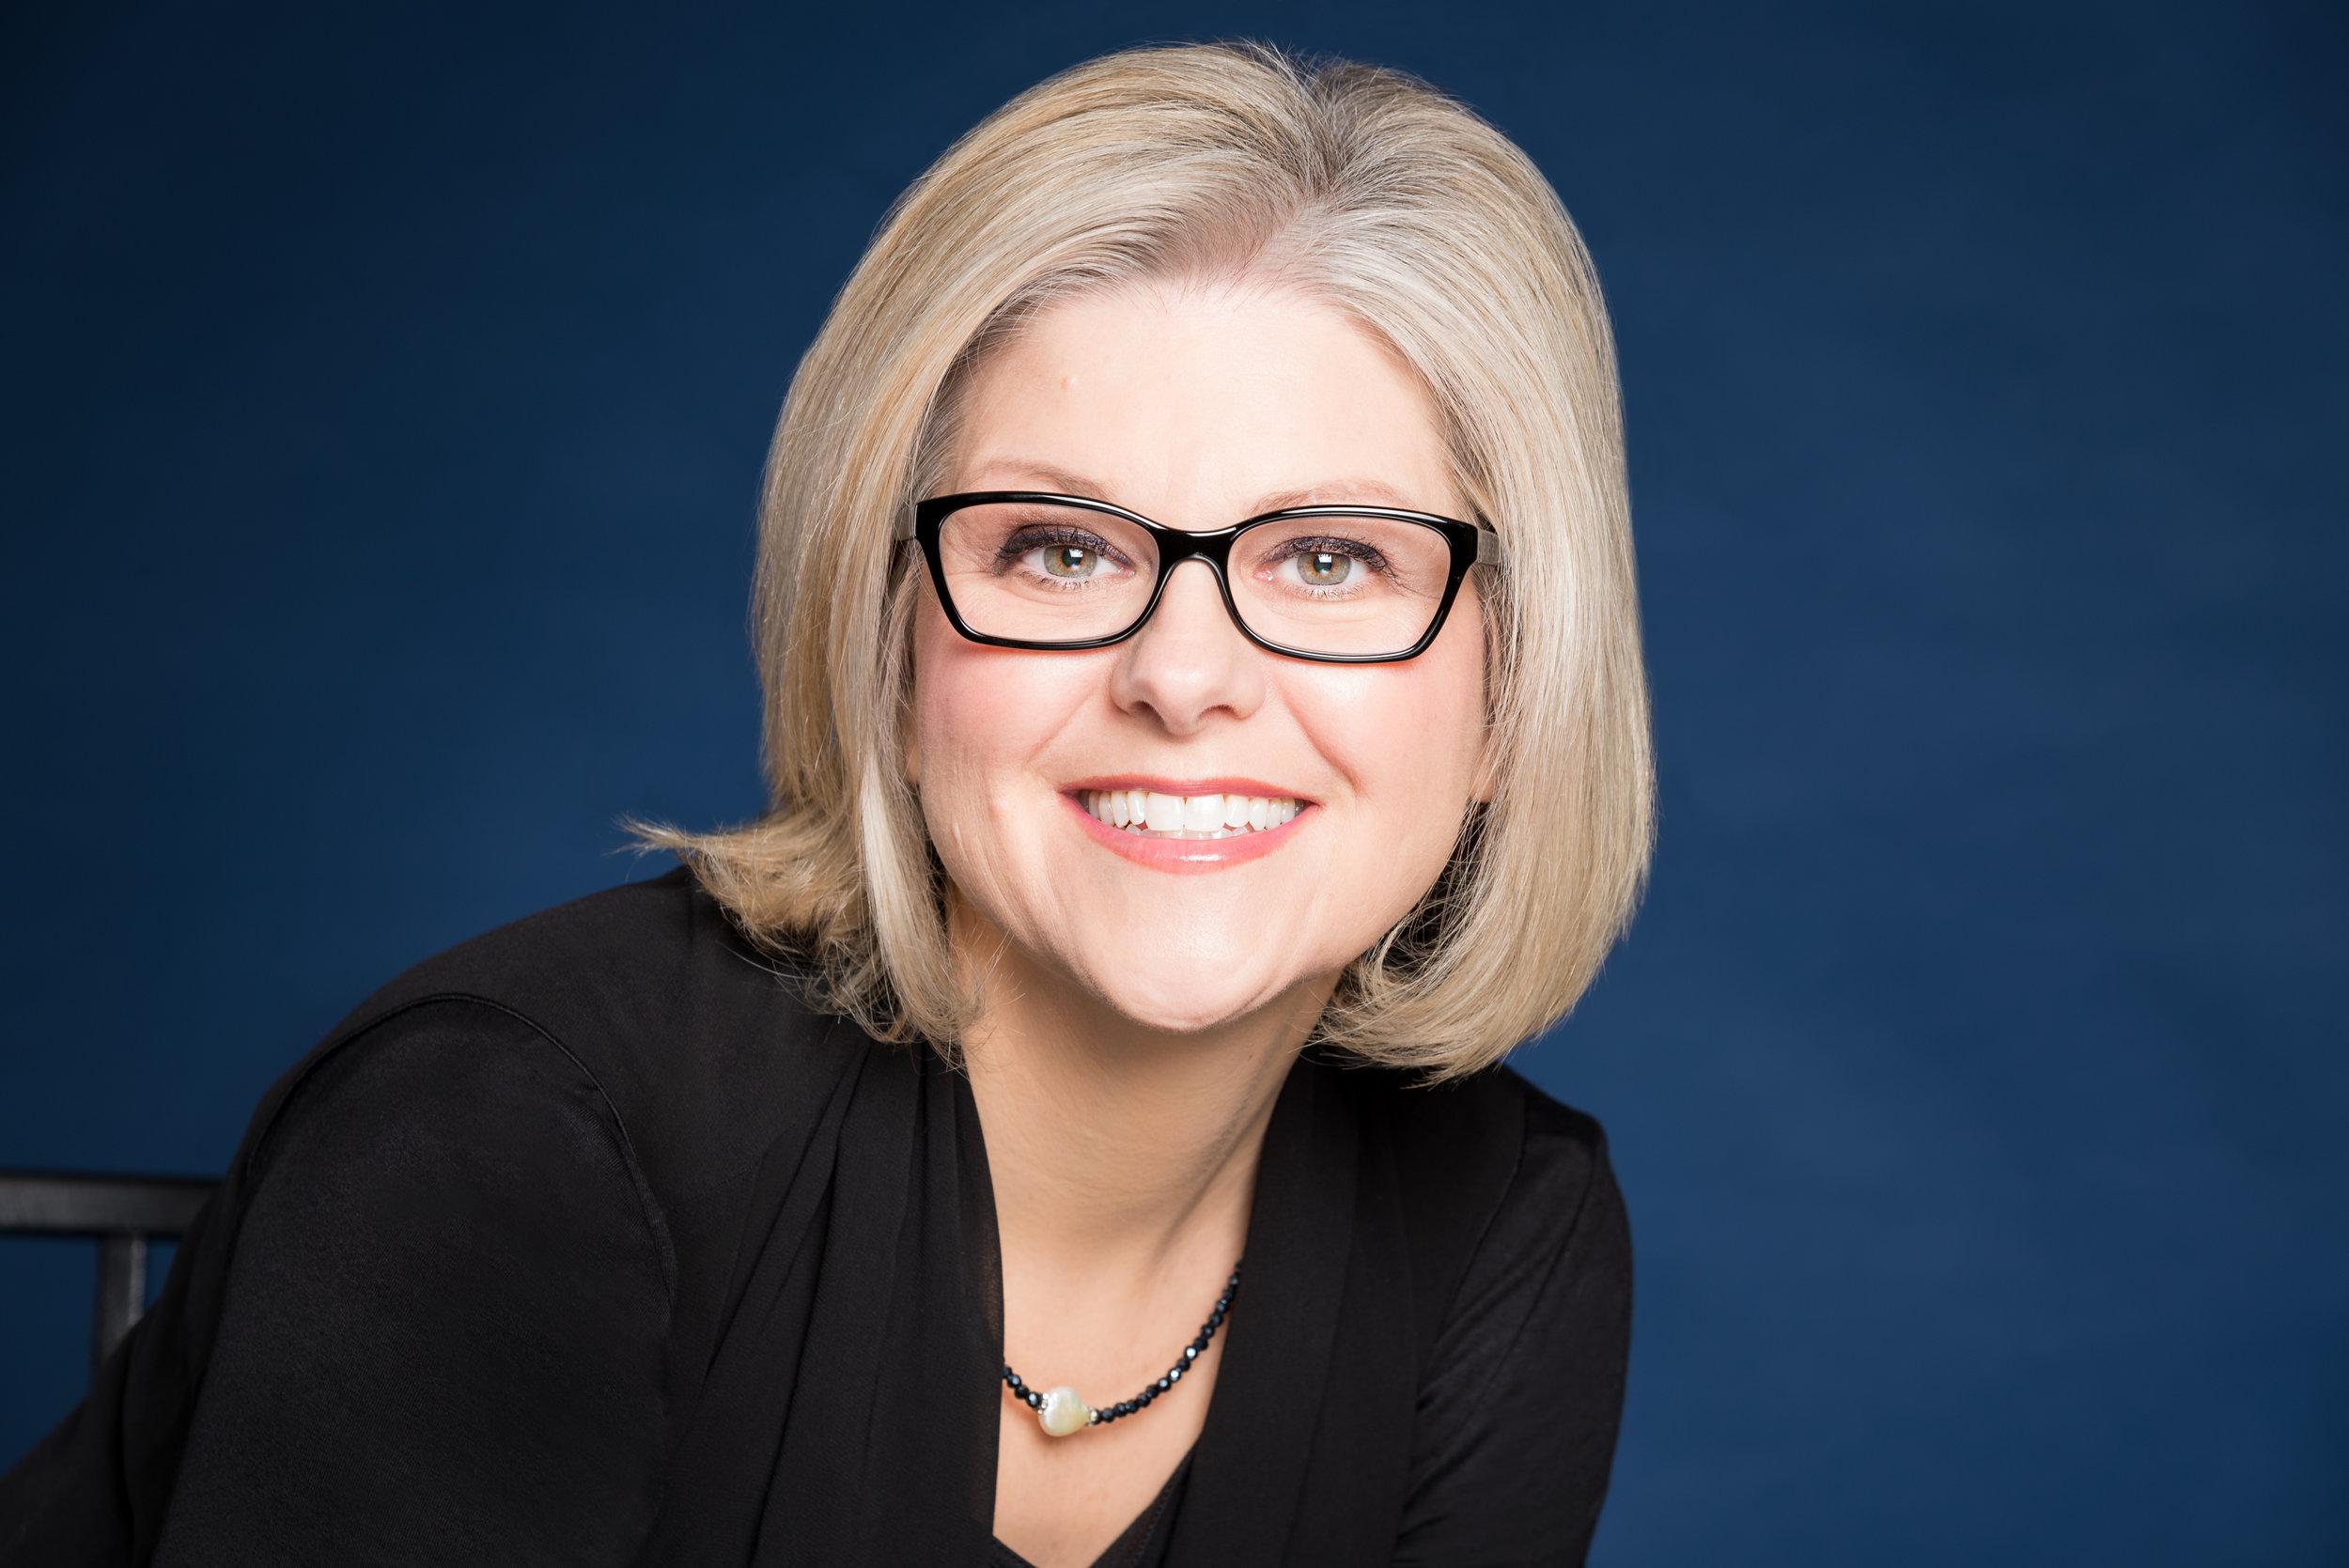 Margaret Roche MS, RD, CDE, CSG, FAND